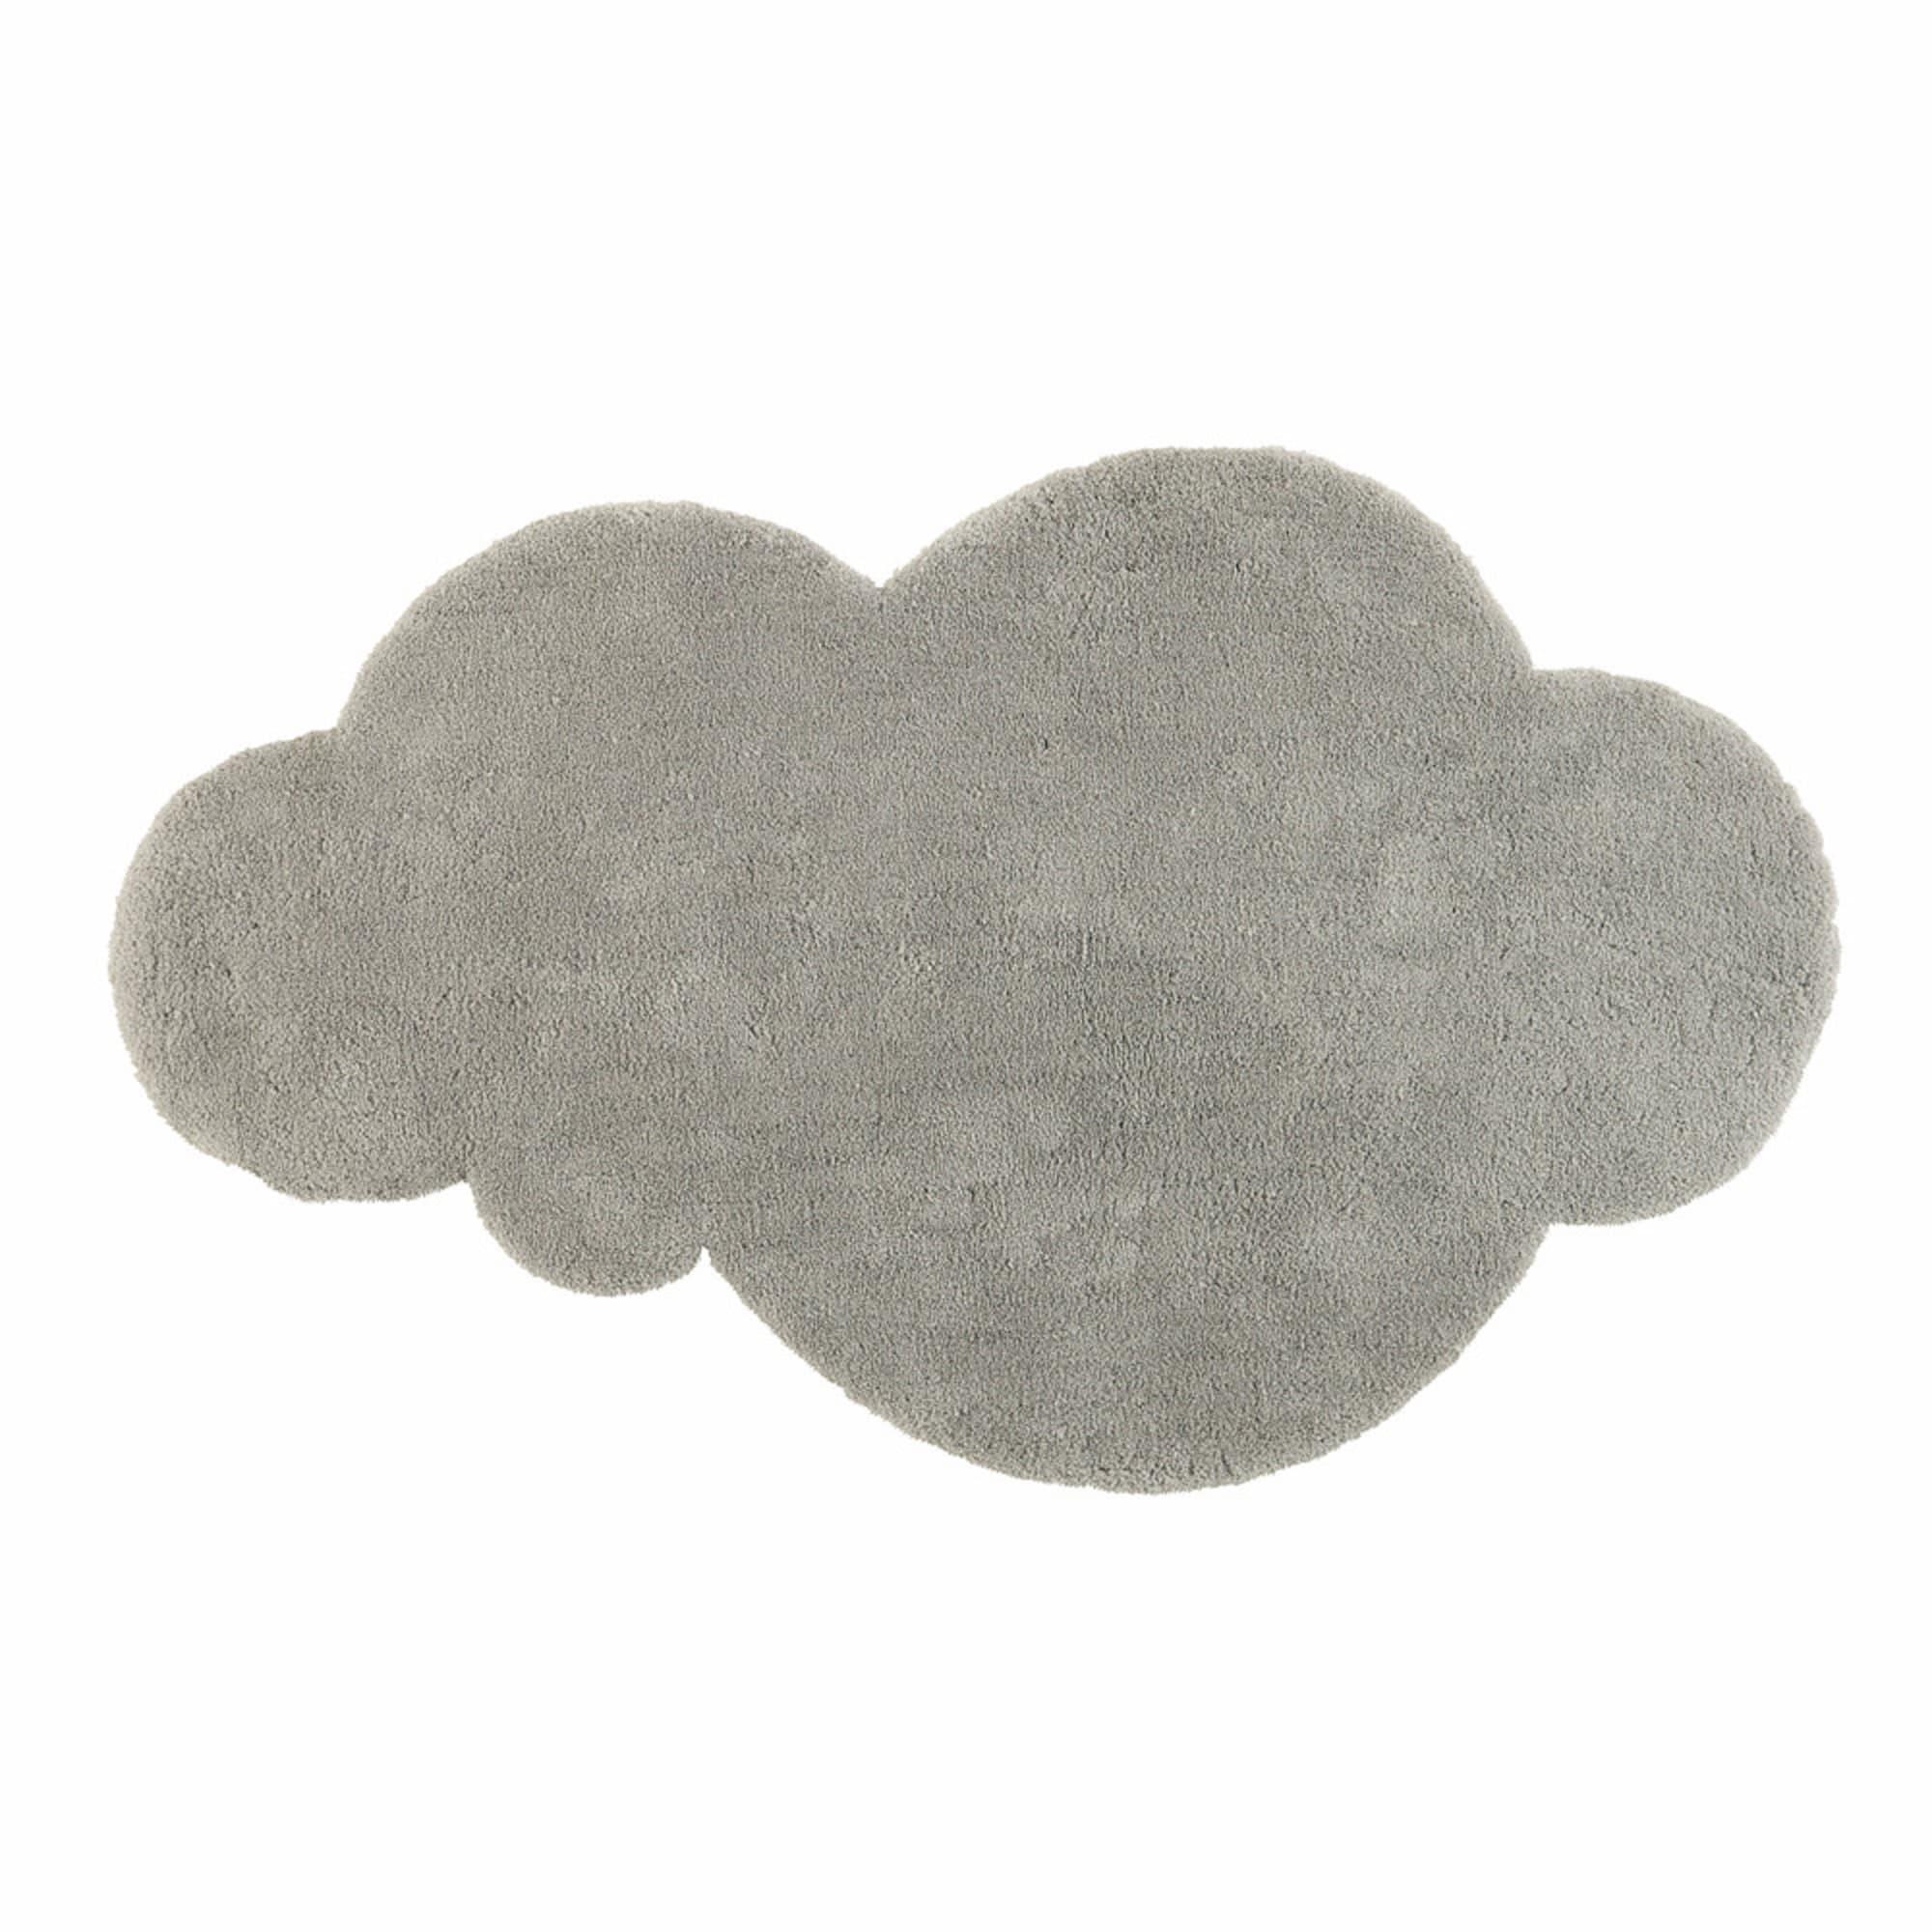 tapis-nuage-gris-125x200-1000-16-35-1599